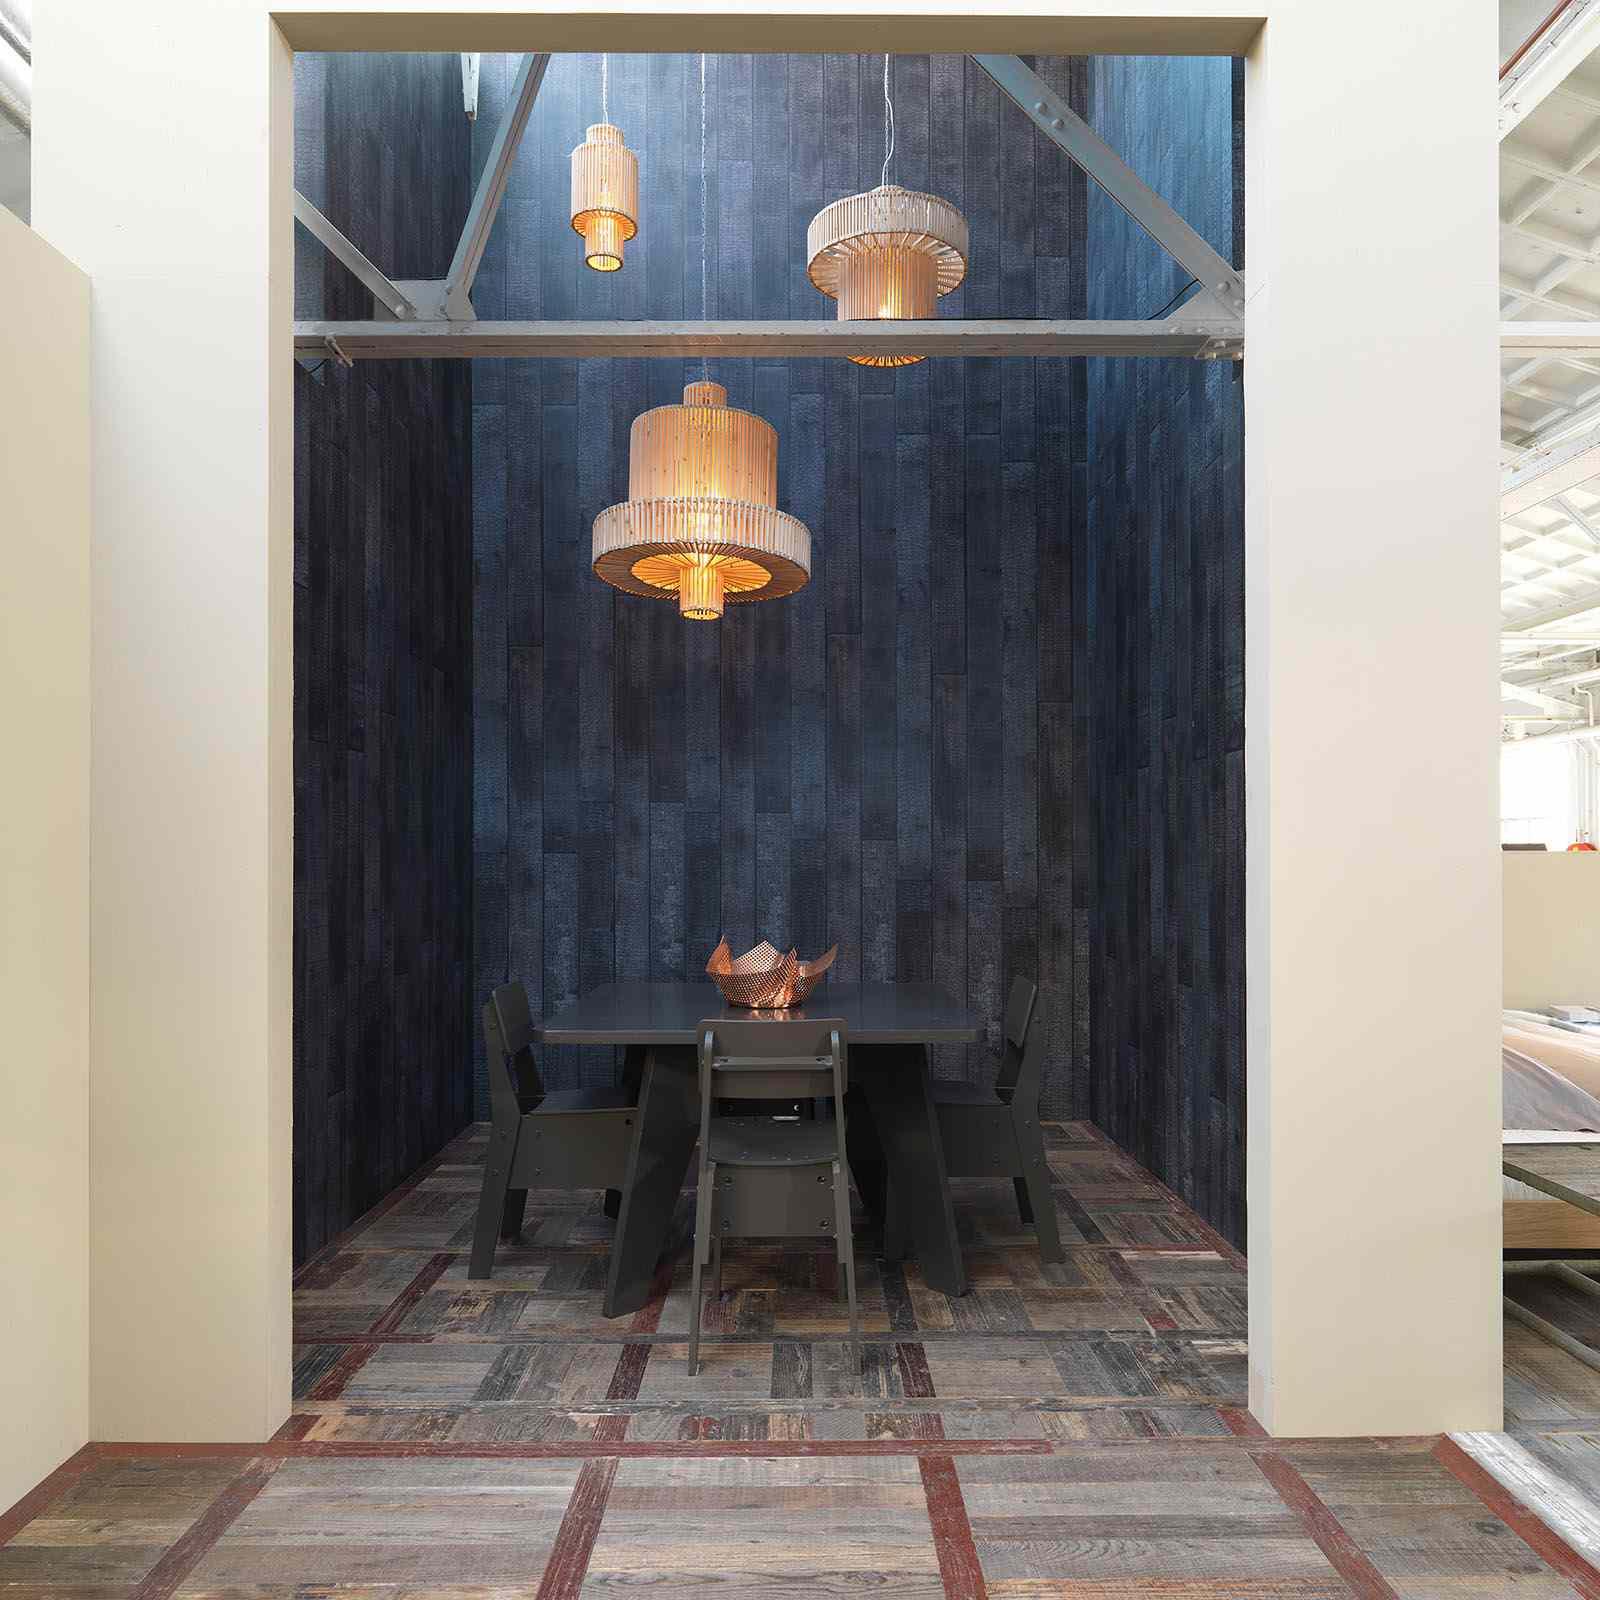 Burnt Wood Wallpaper by Maarten Baas and Piet Hein Eek for NLXL